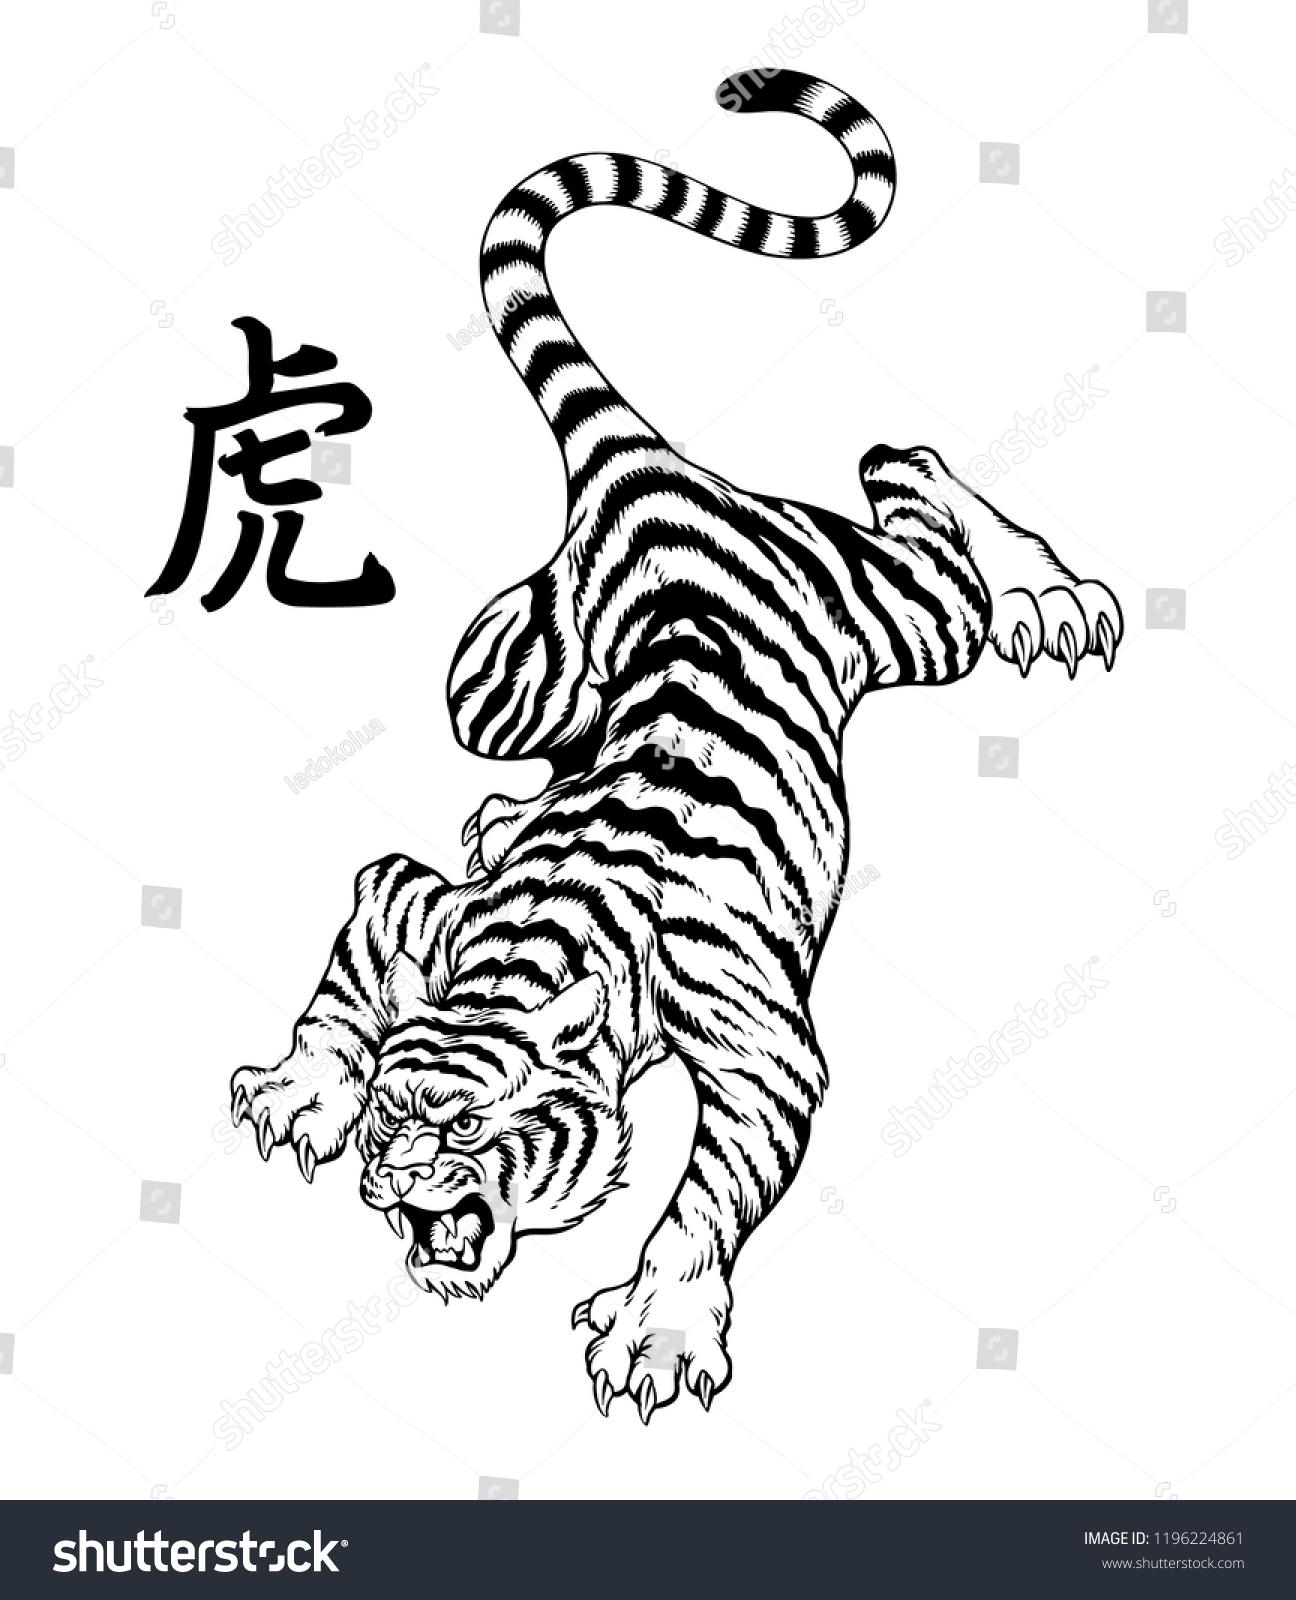 48e6486c363e1 Tiger tattoo, black and white vector illustration. Inscription on  illustration is a hieroglyph of.